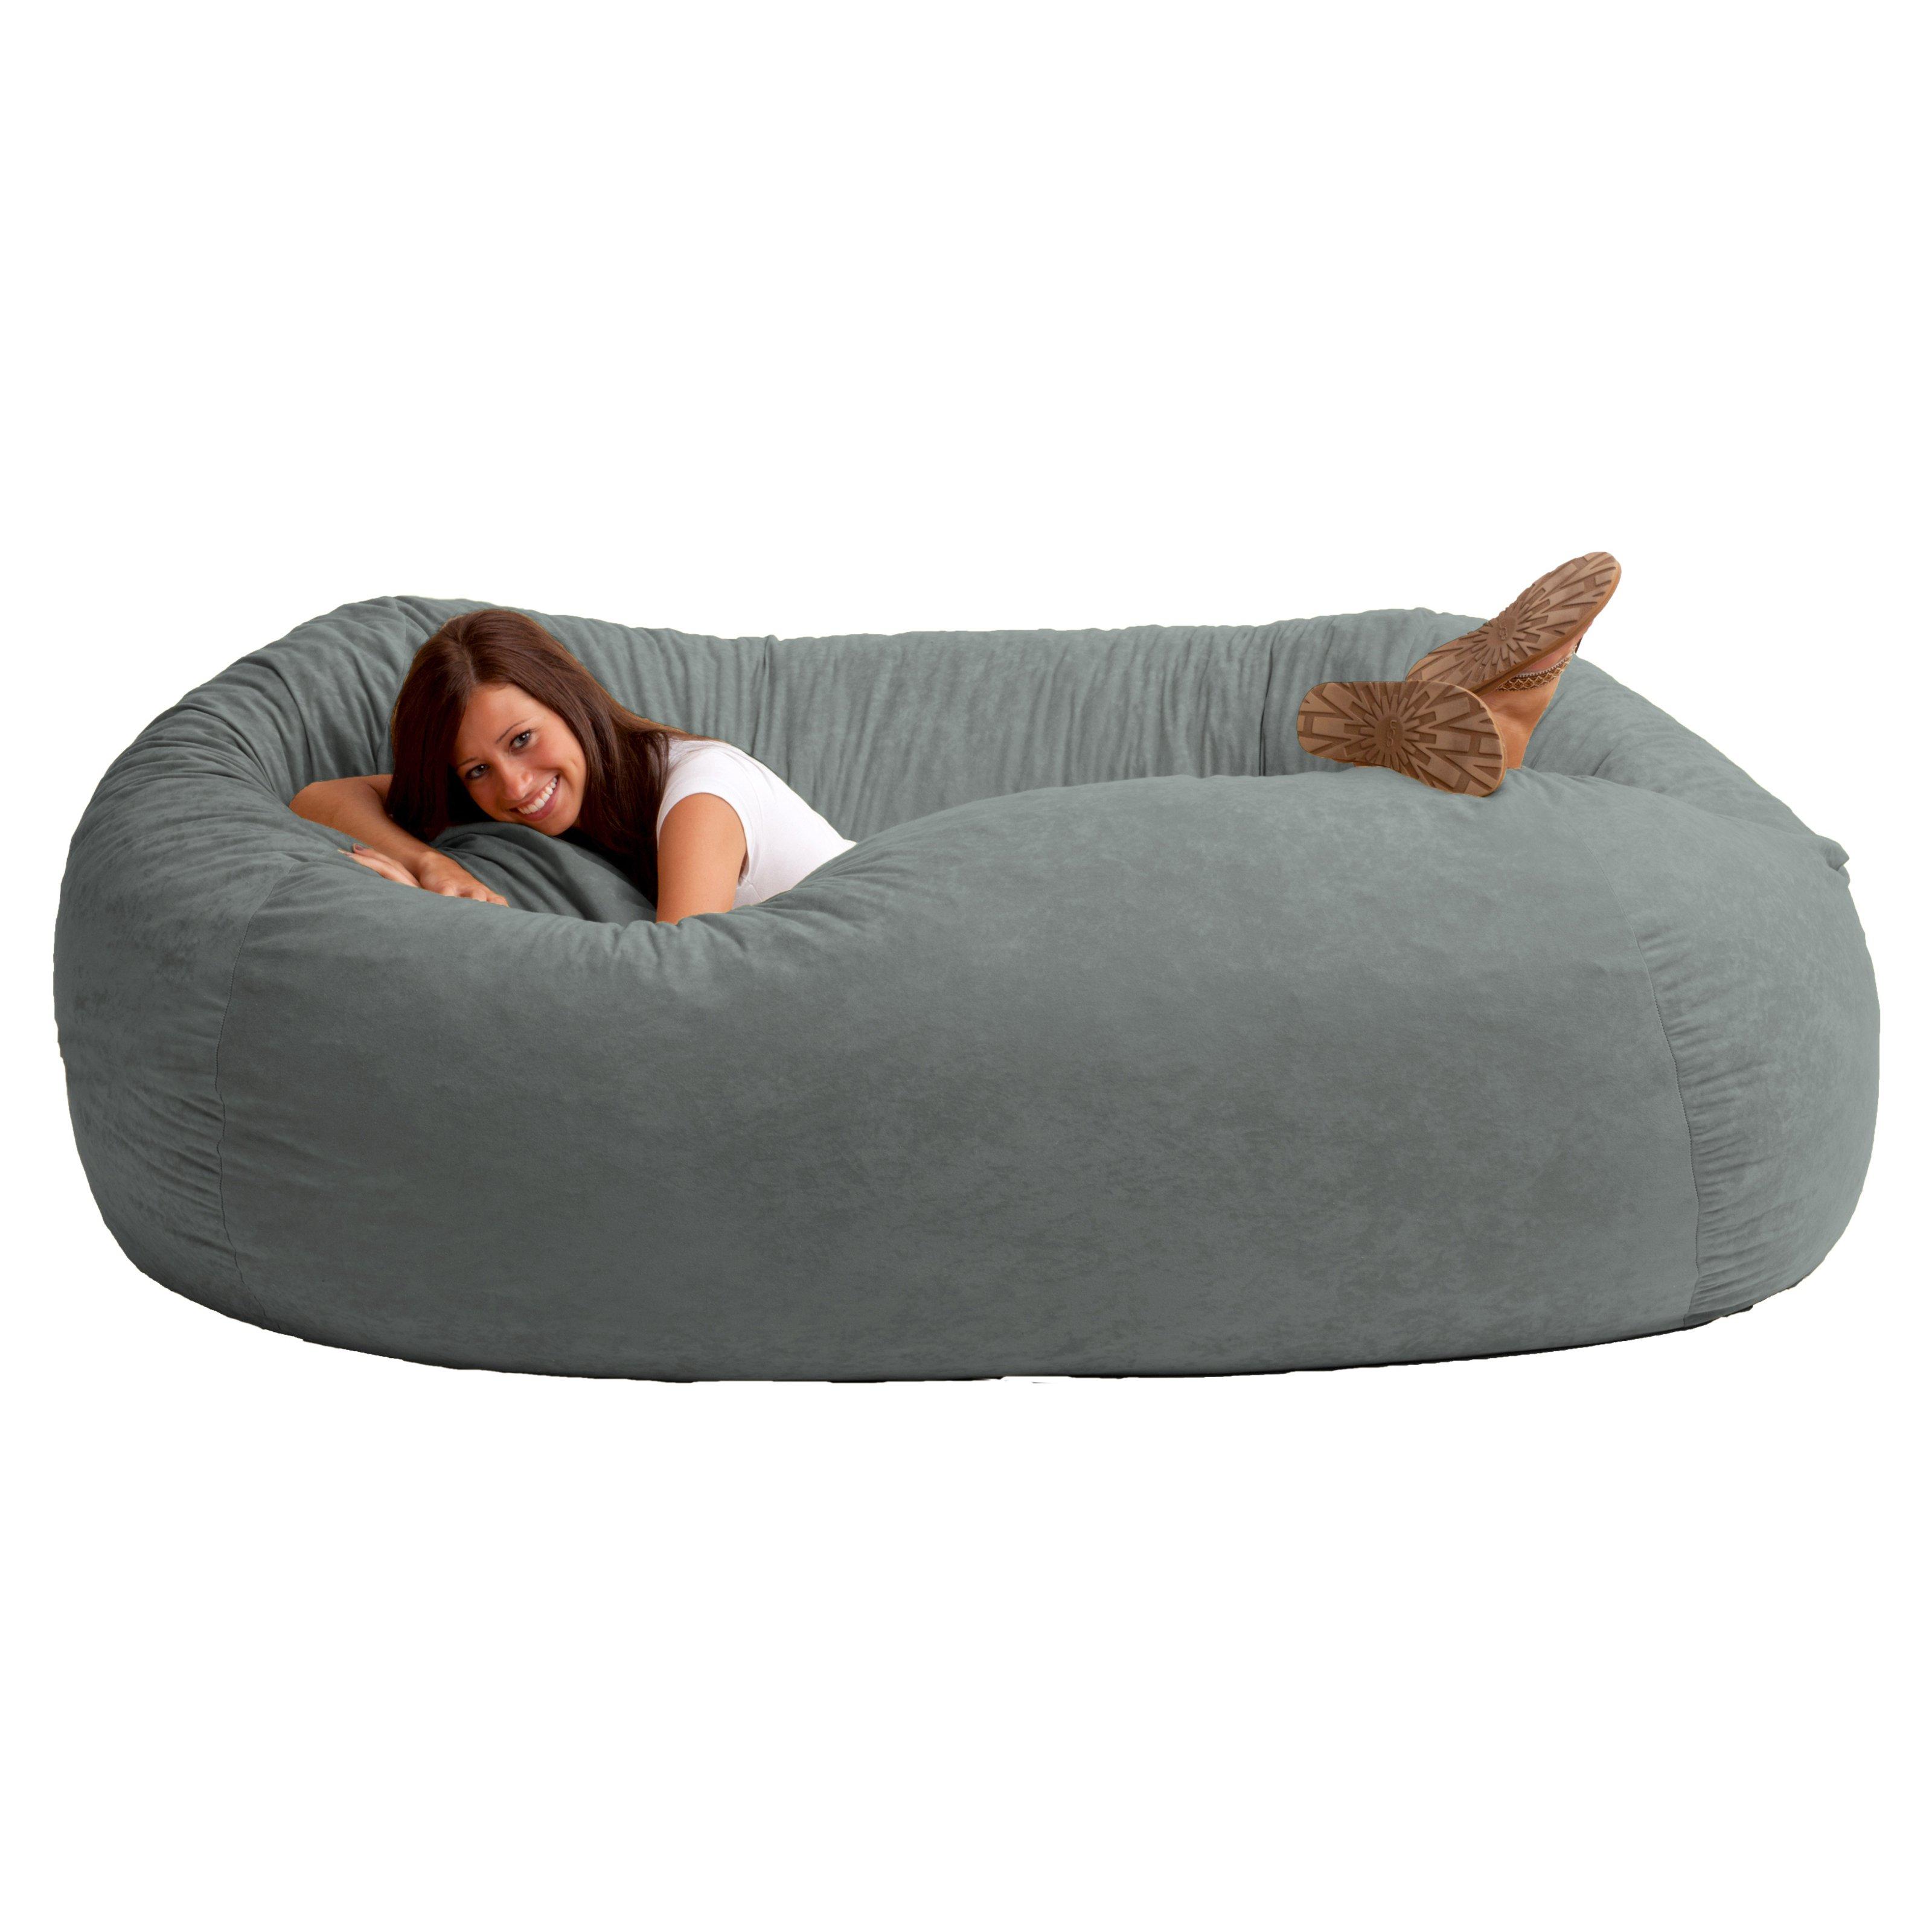 xxl comfort suede bean bag sofa - bean bags at hayneedle ZEVAWRG